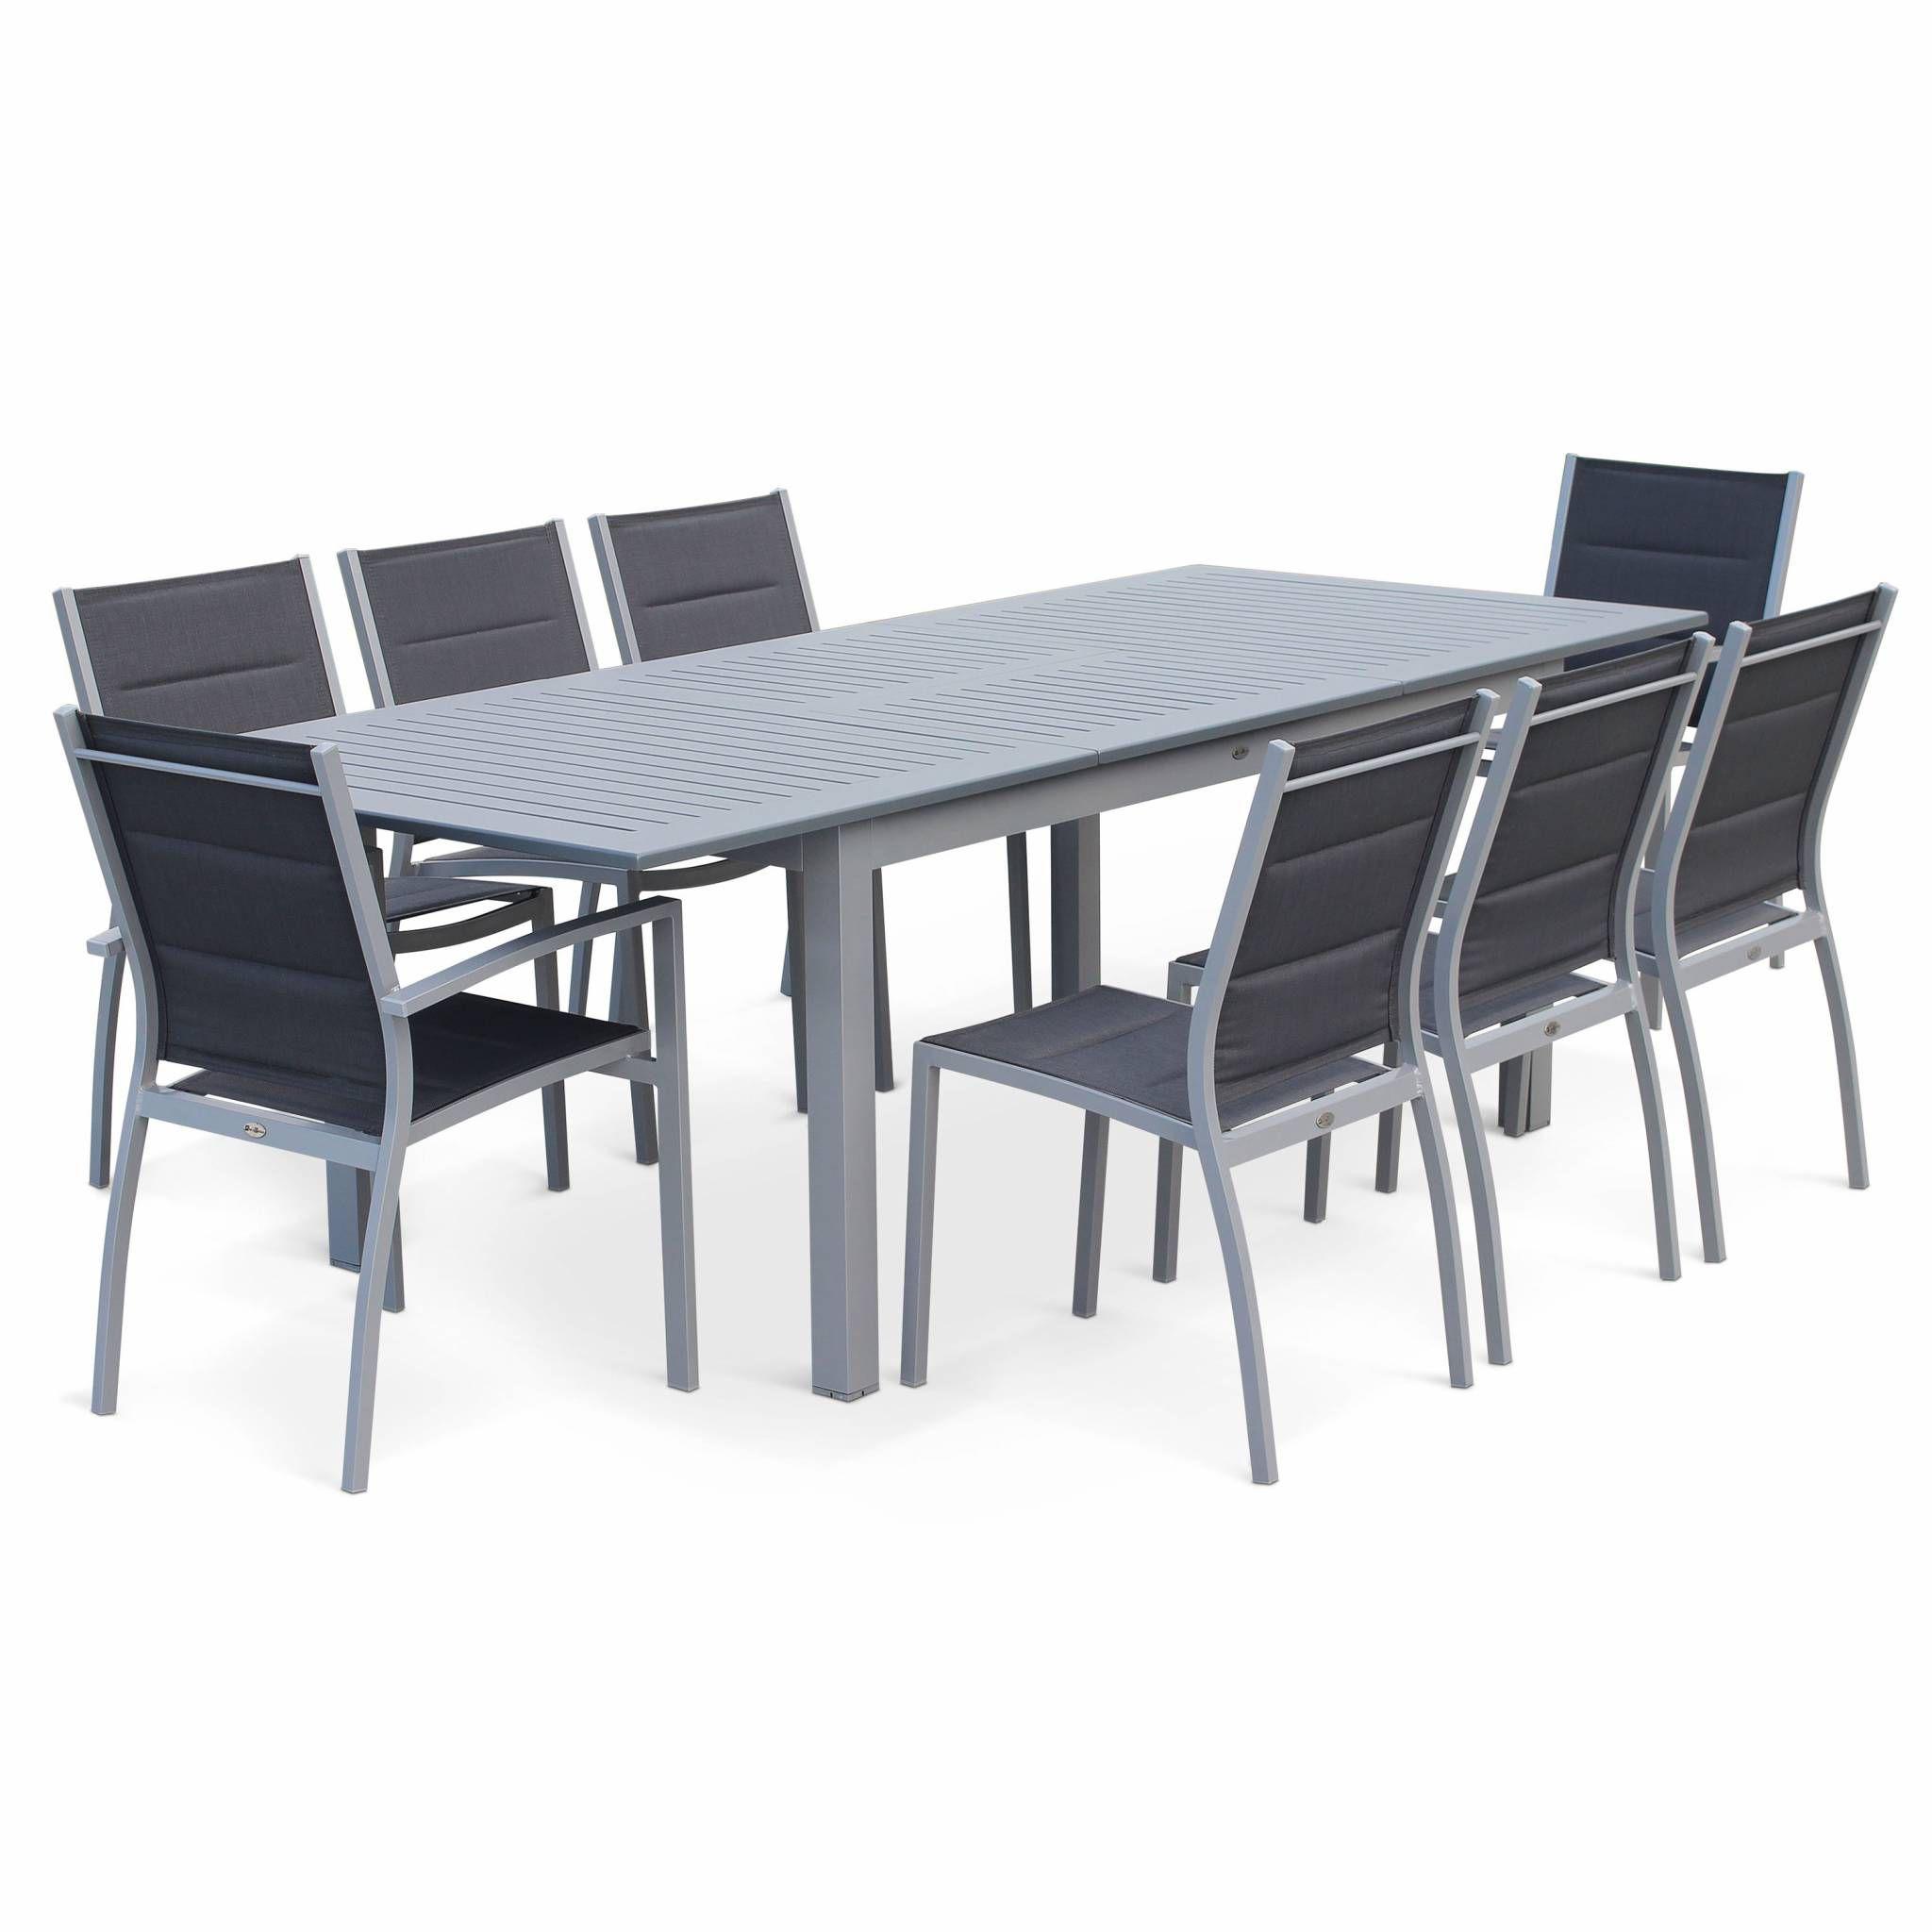 Salon de jardin en aluminium